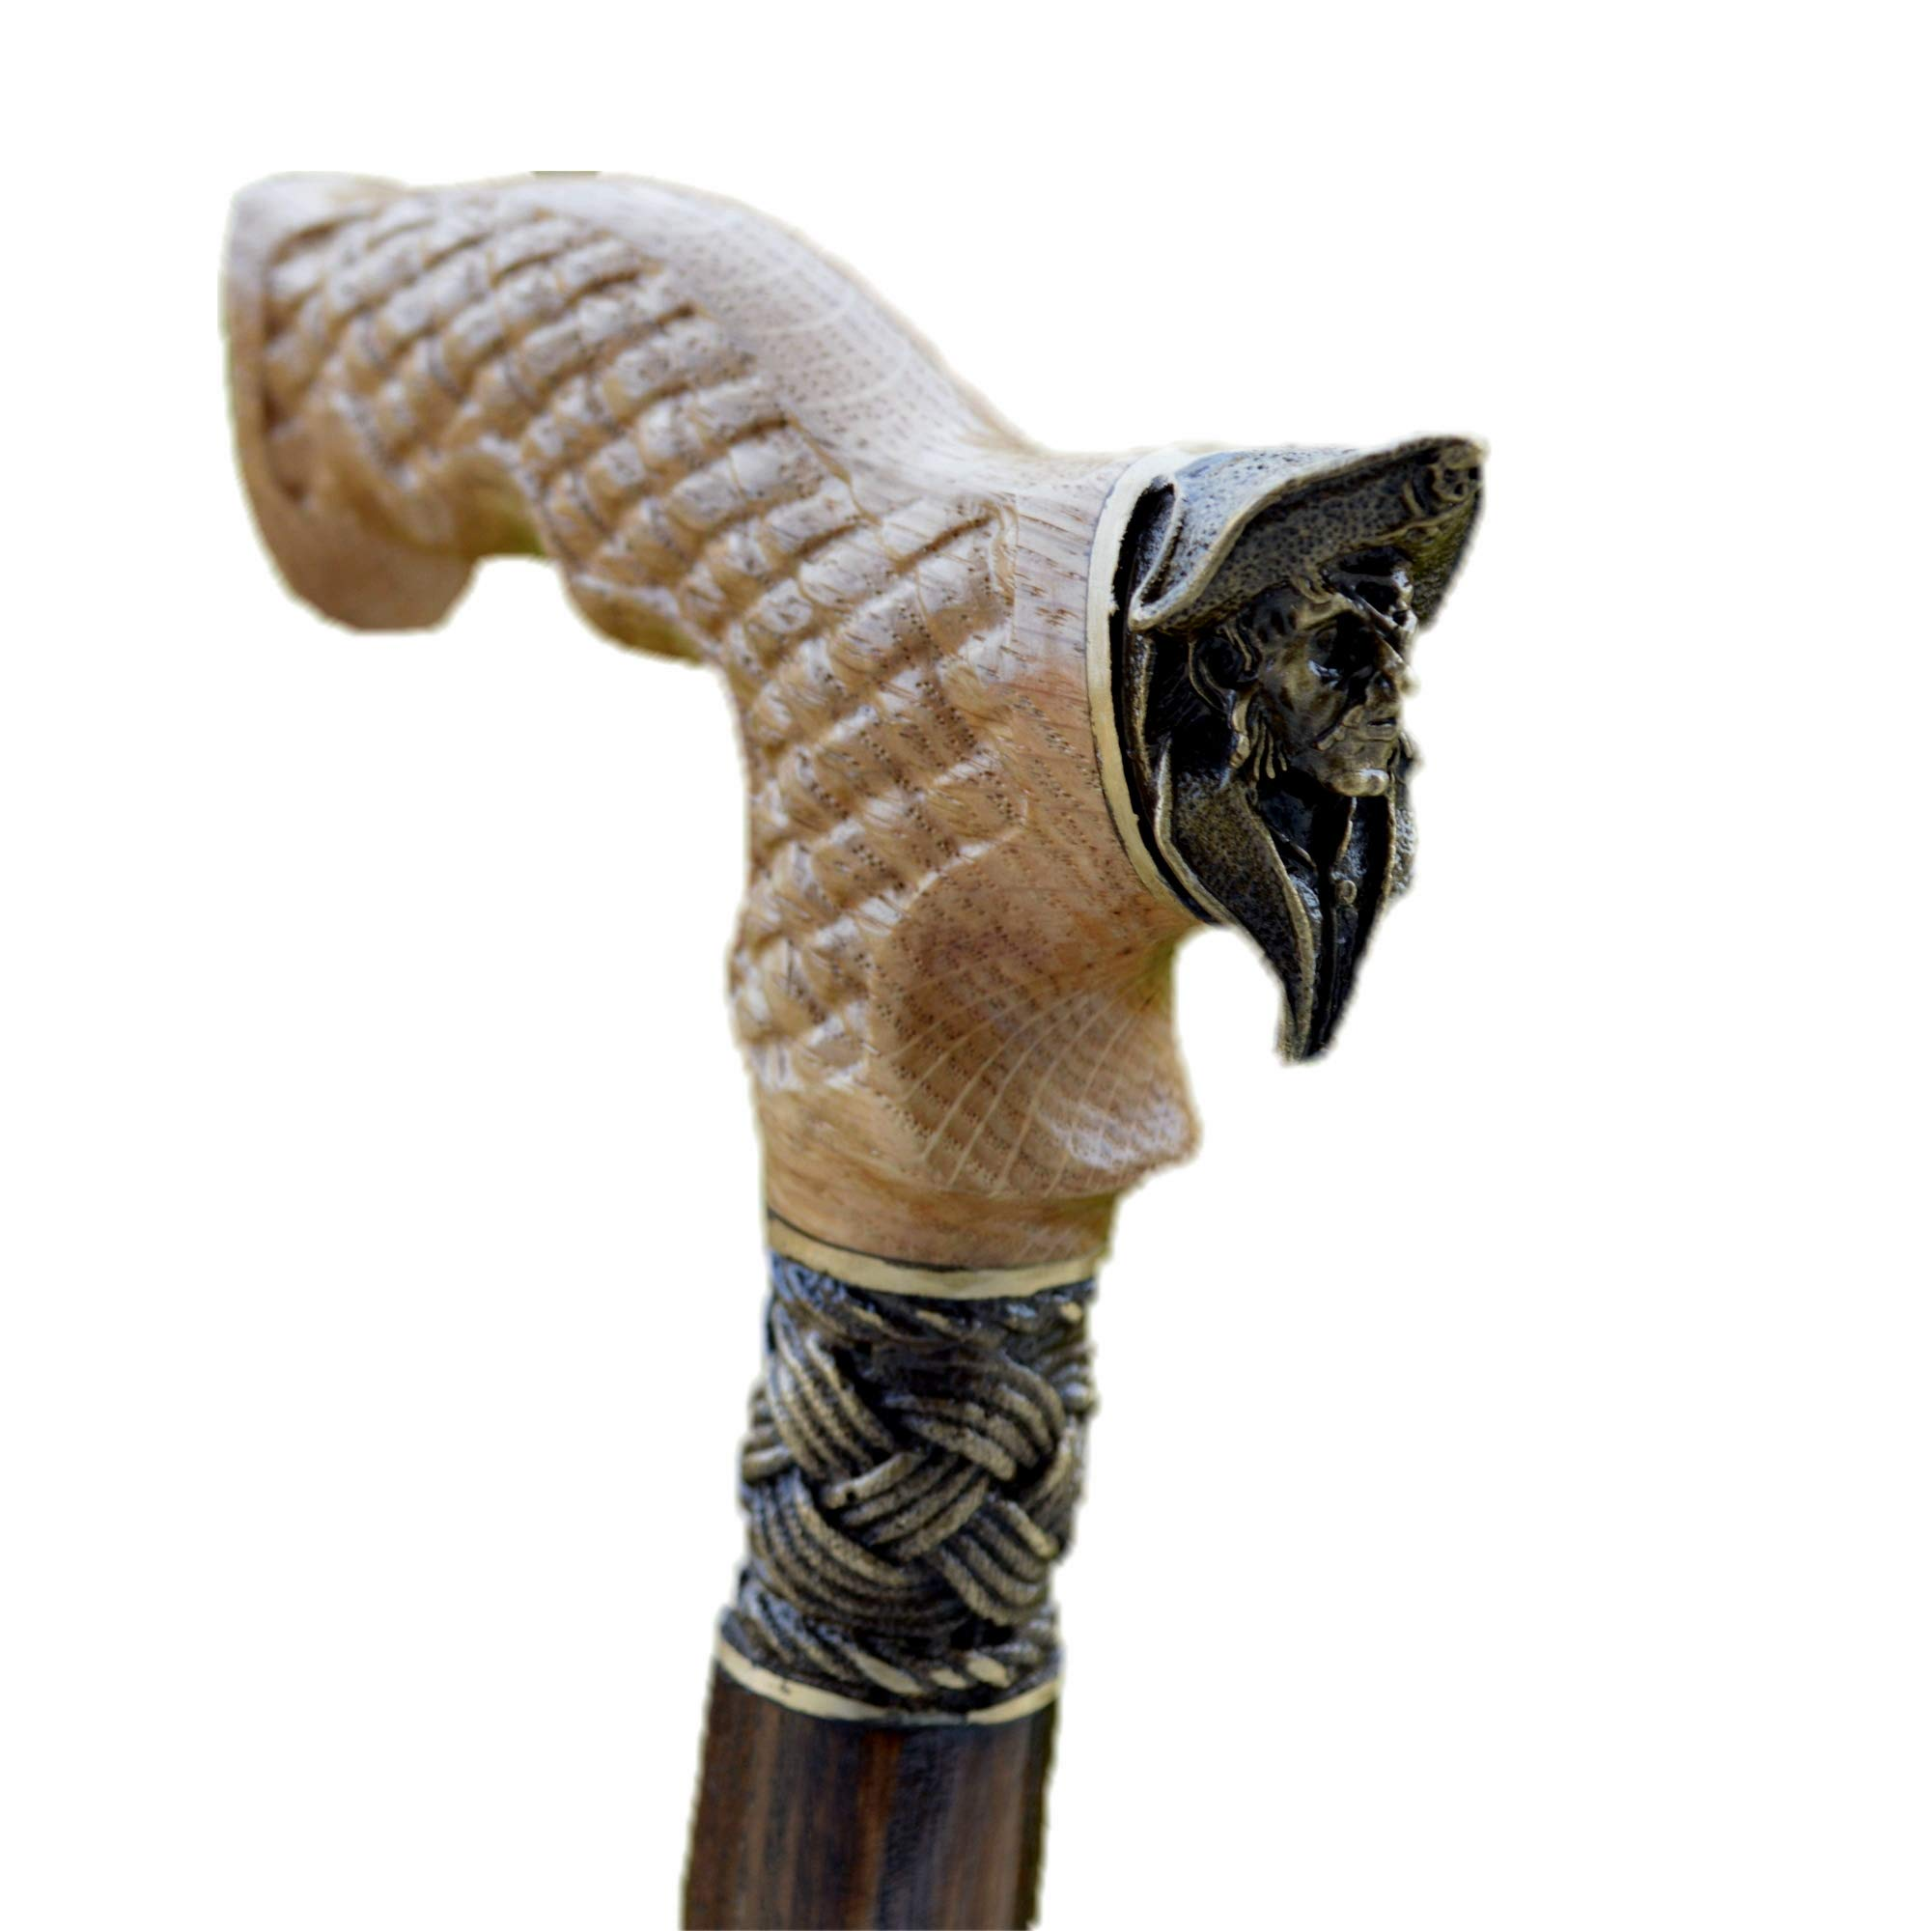 oleksandr.victory Canes Walking Sticks Wood Reeds Bronze Wooden BURL Handmade Cane Stick Men's Accessories (Bear) (Pirate)